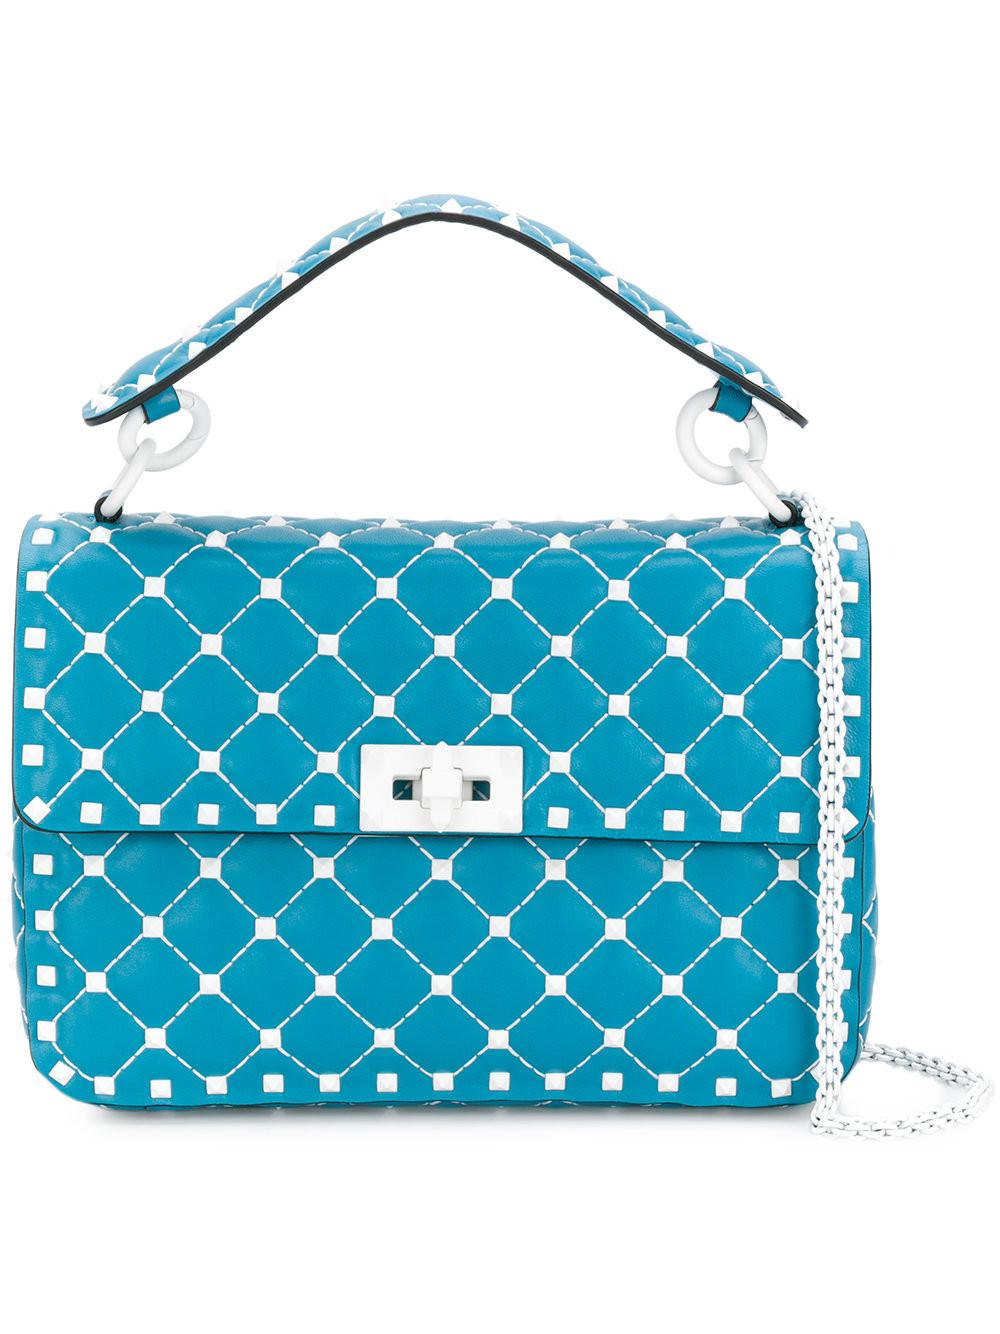 b87e11f5284e Lyst - Valentino Garavani Rockstud Spike Crossbody Bag in Blue